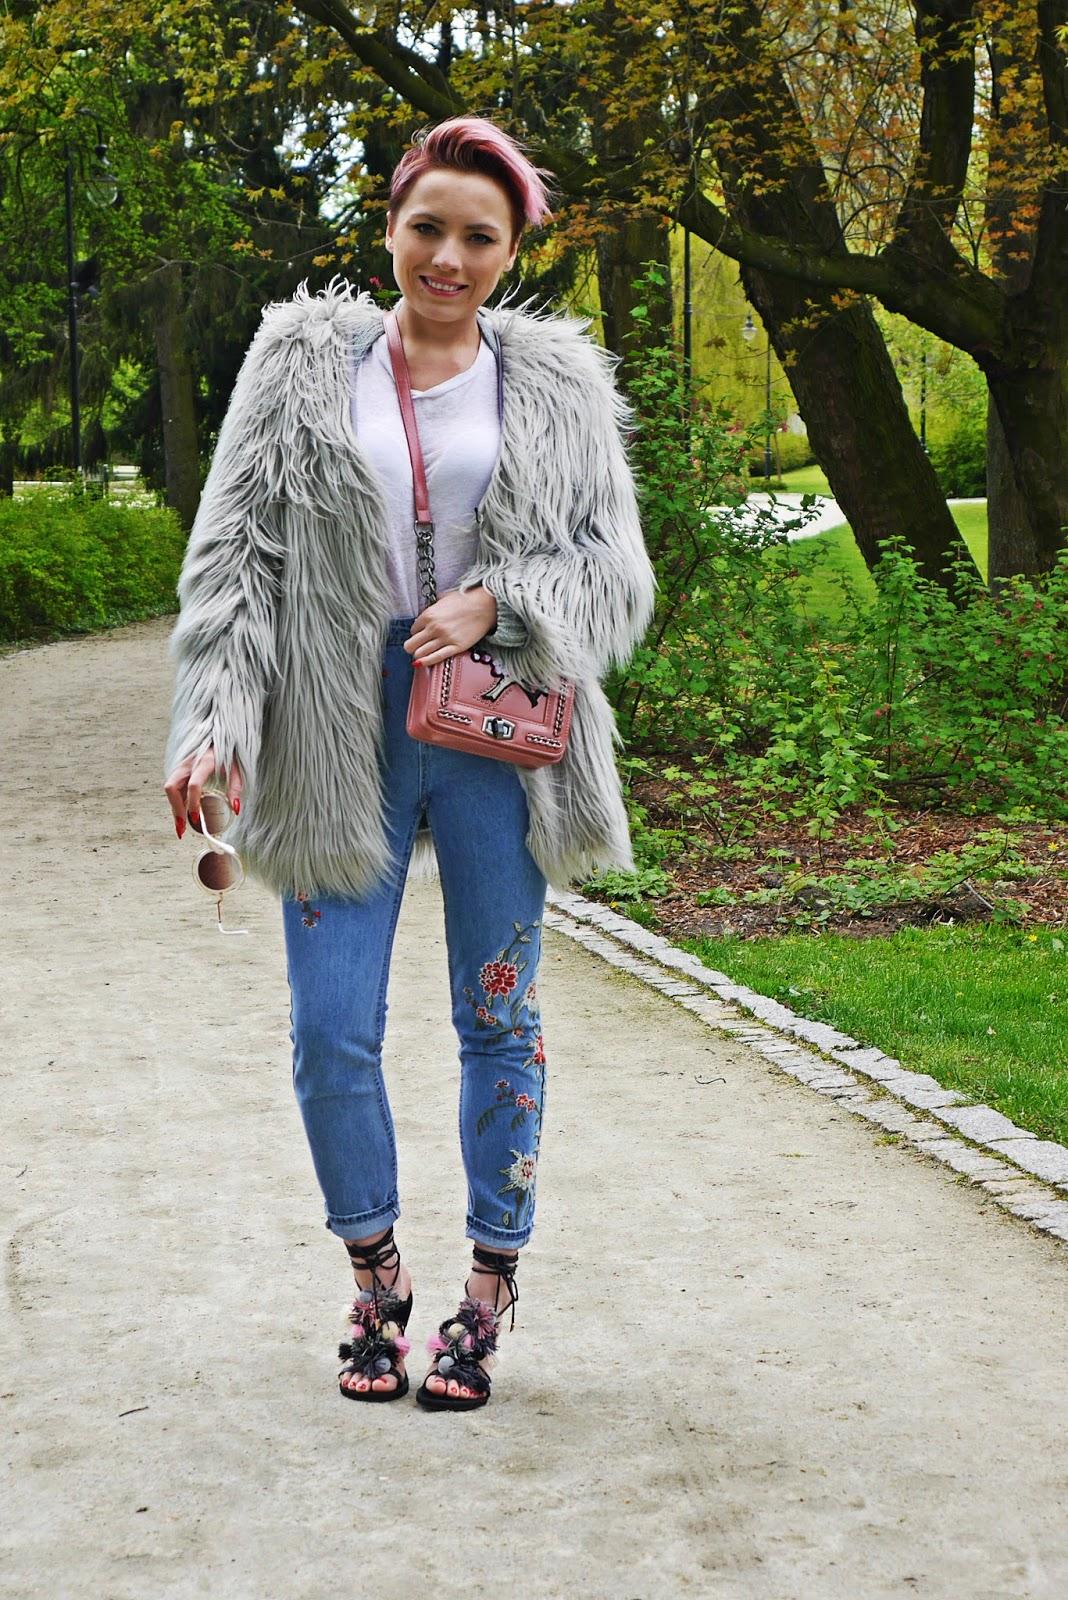 spodnie_haft_szare_futerko_look_ootd_karyn_blog_020517